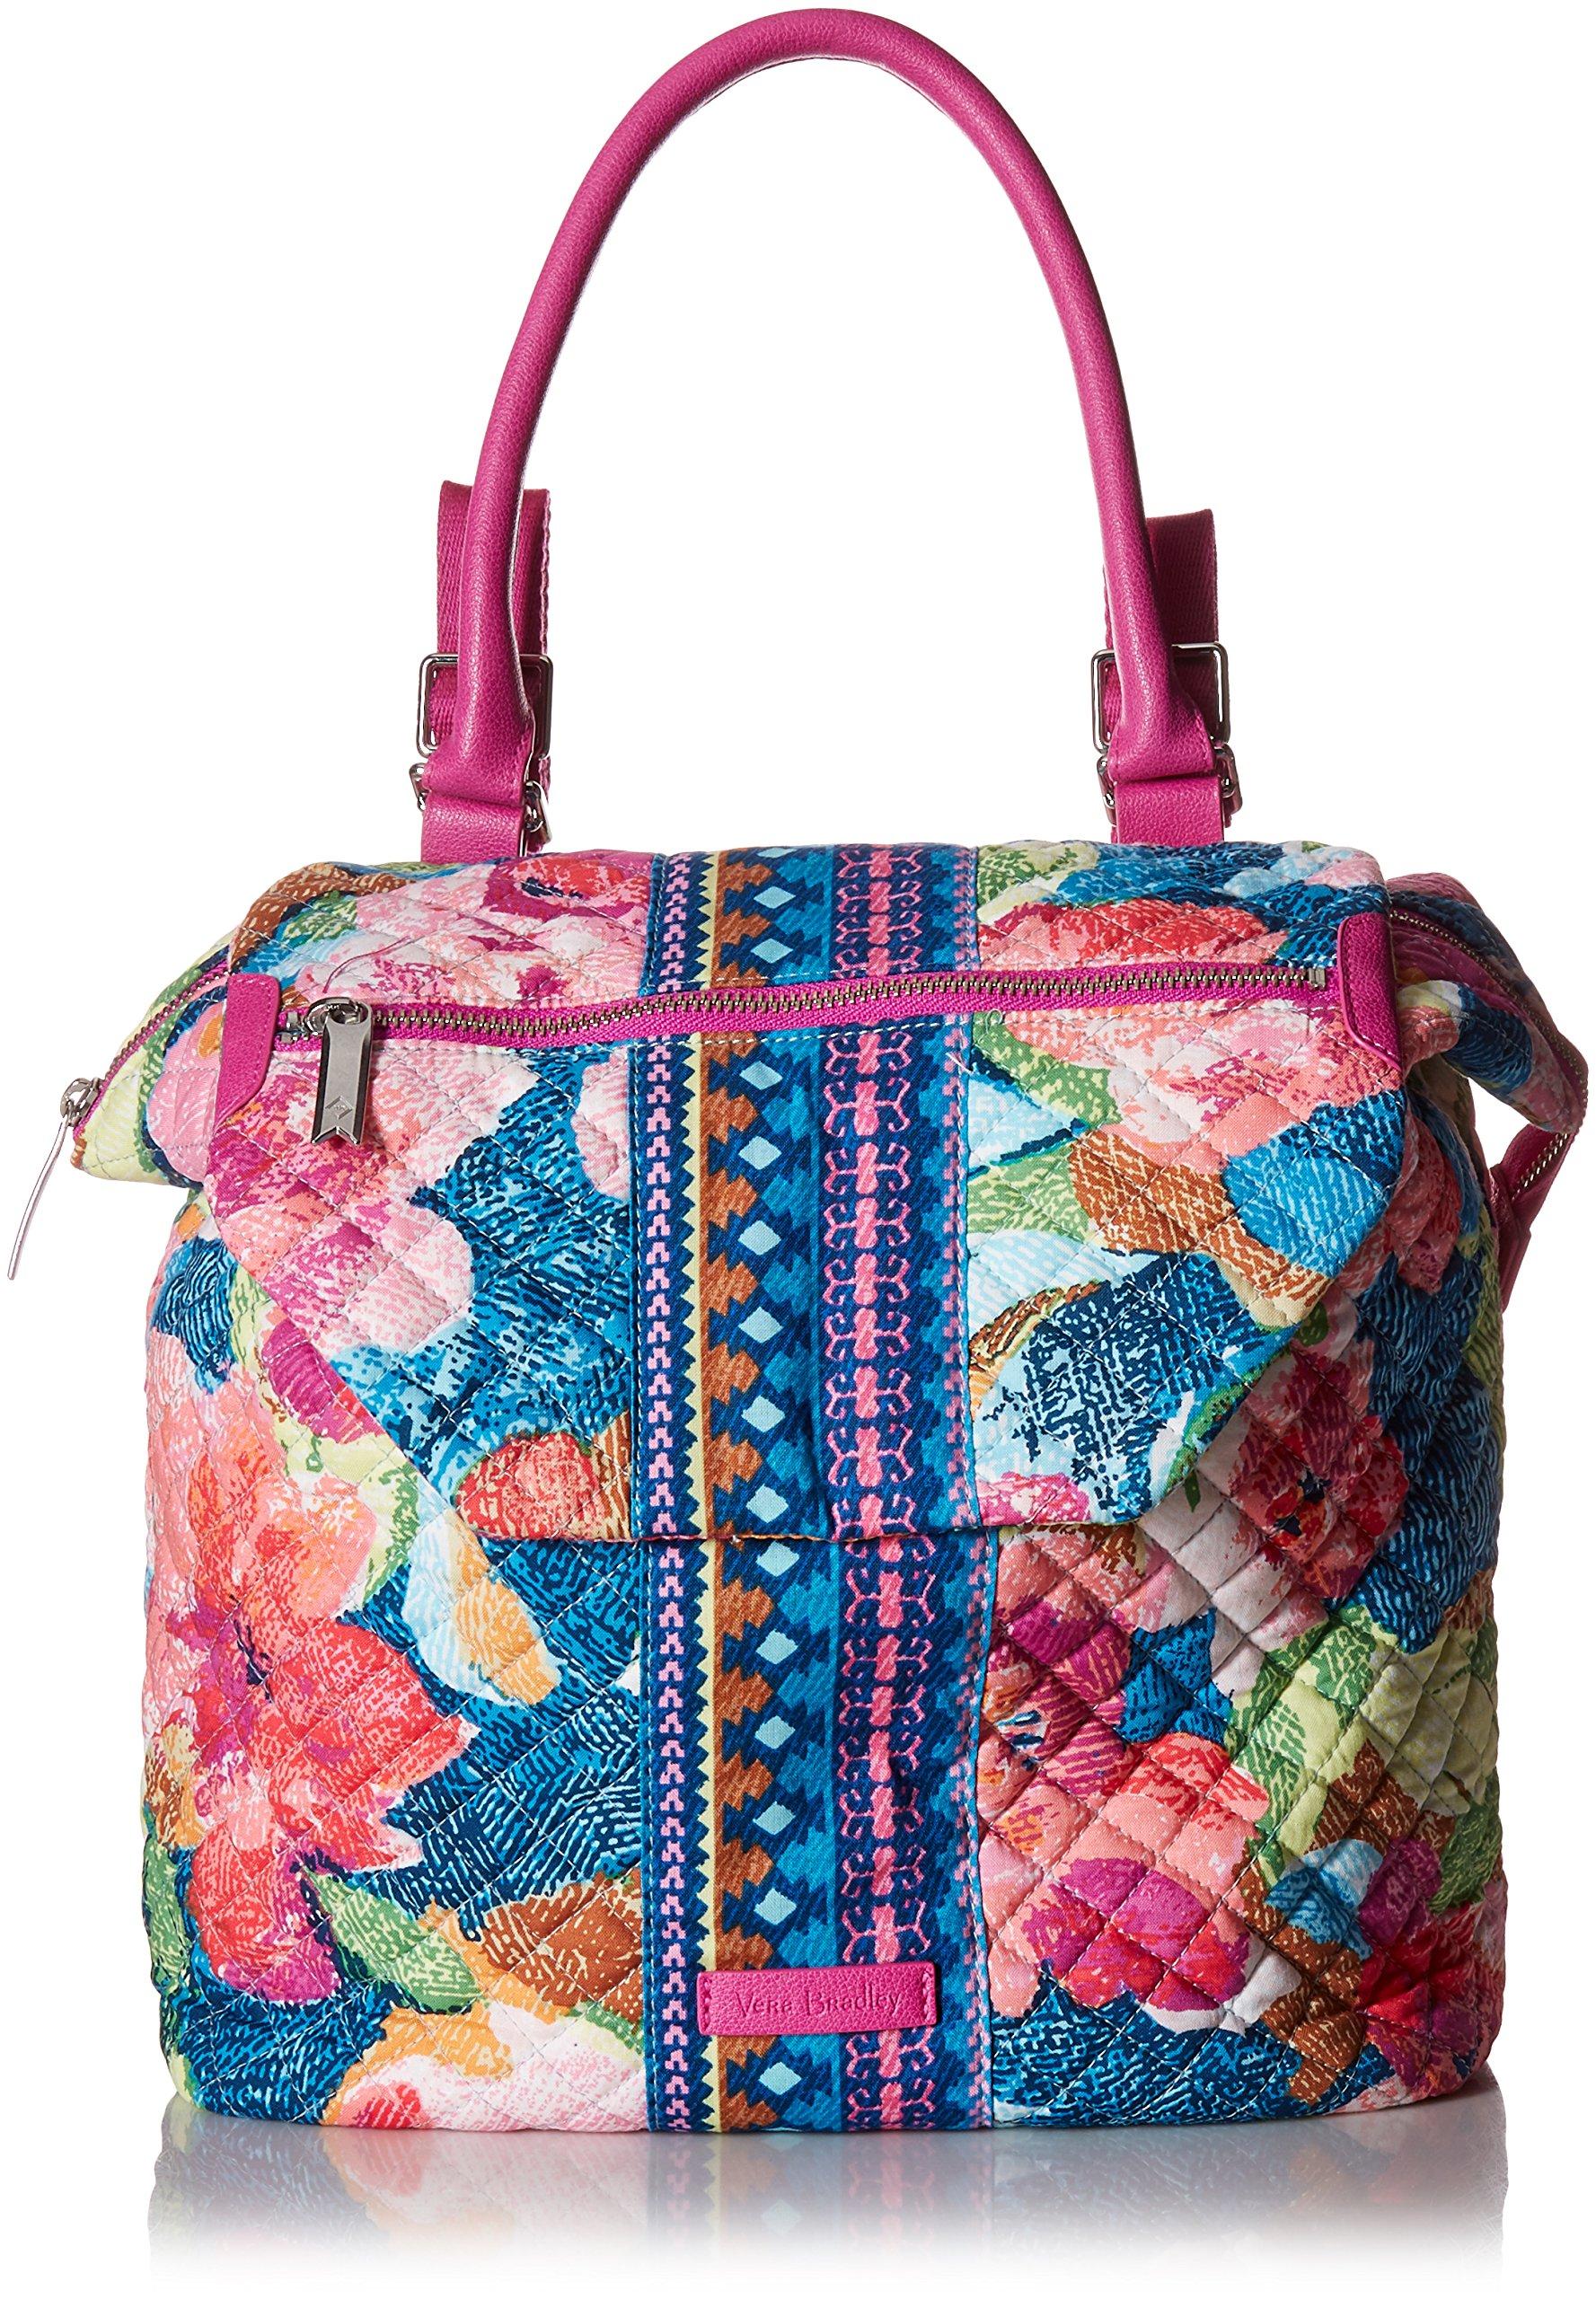 Vera Bradley Change It Up Backpack, Signature Cotton, Superbloom by Vera Bradley